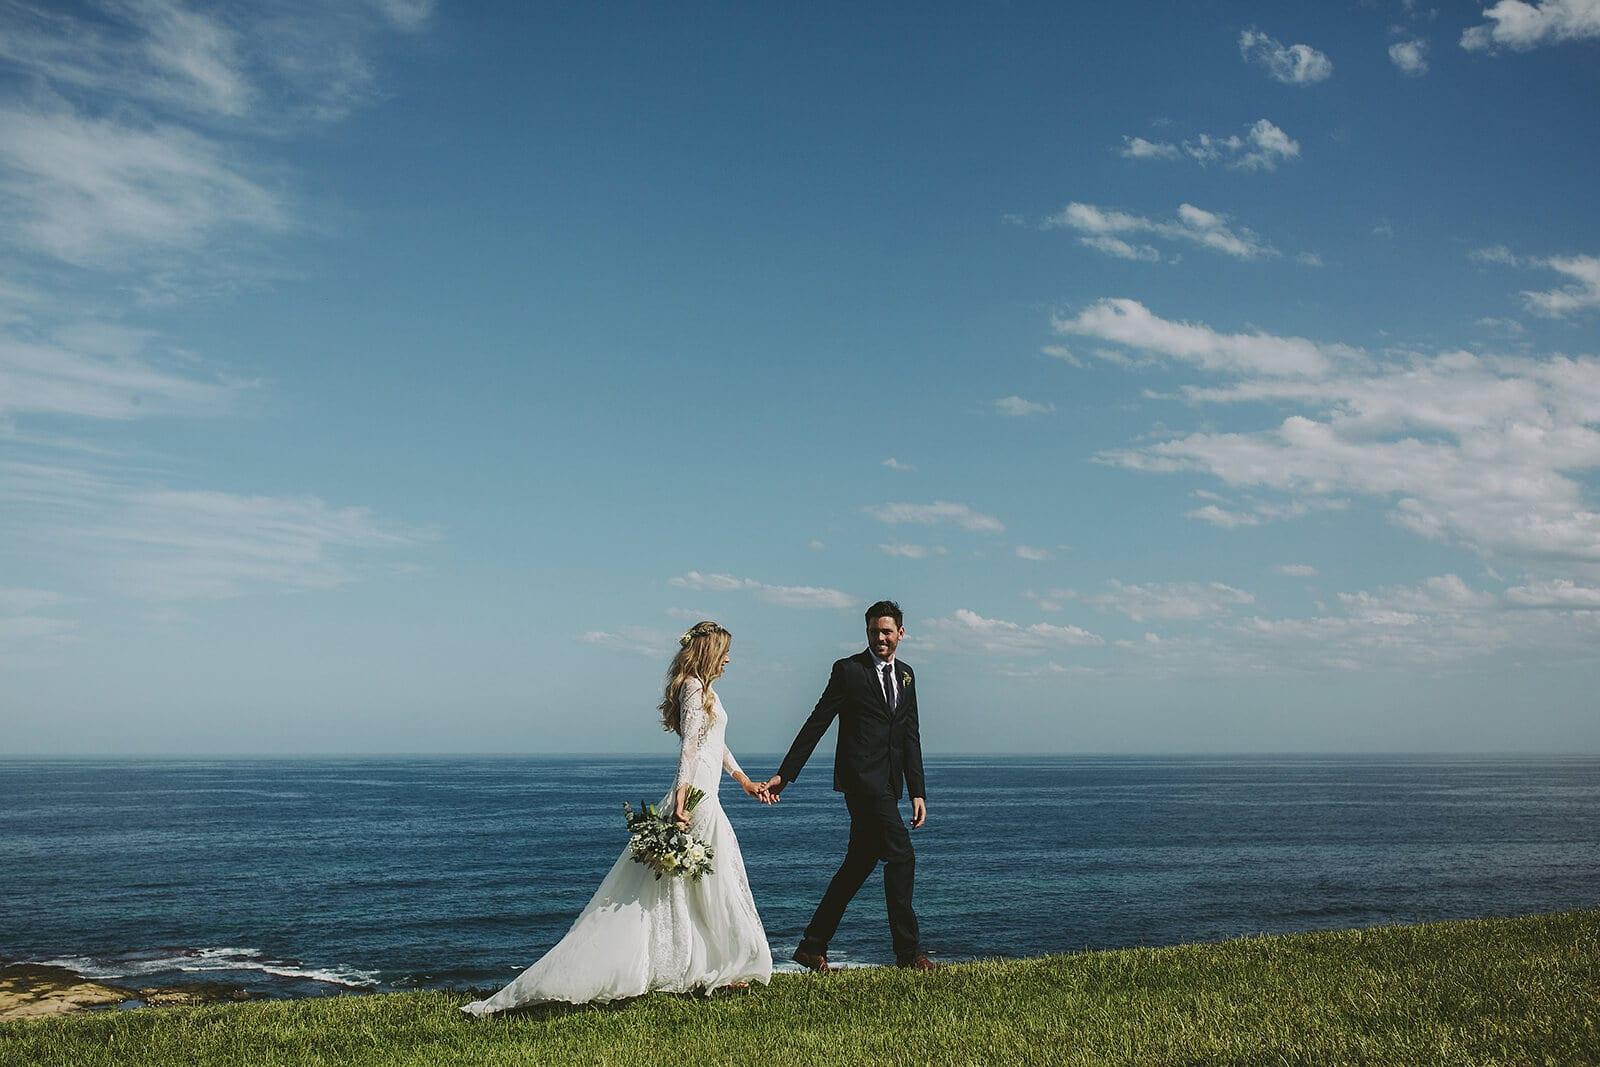 Bride wearing Grace Loves Lace Inca Gown being held by groom on seaside